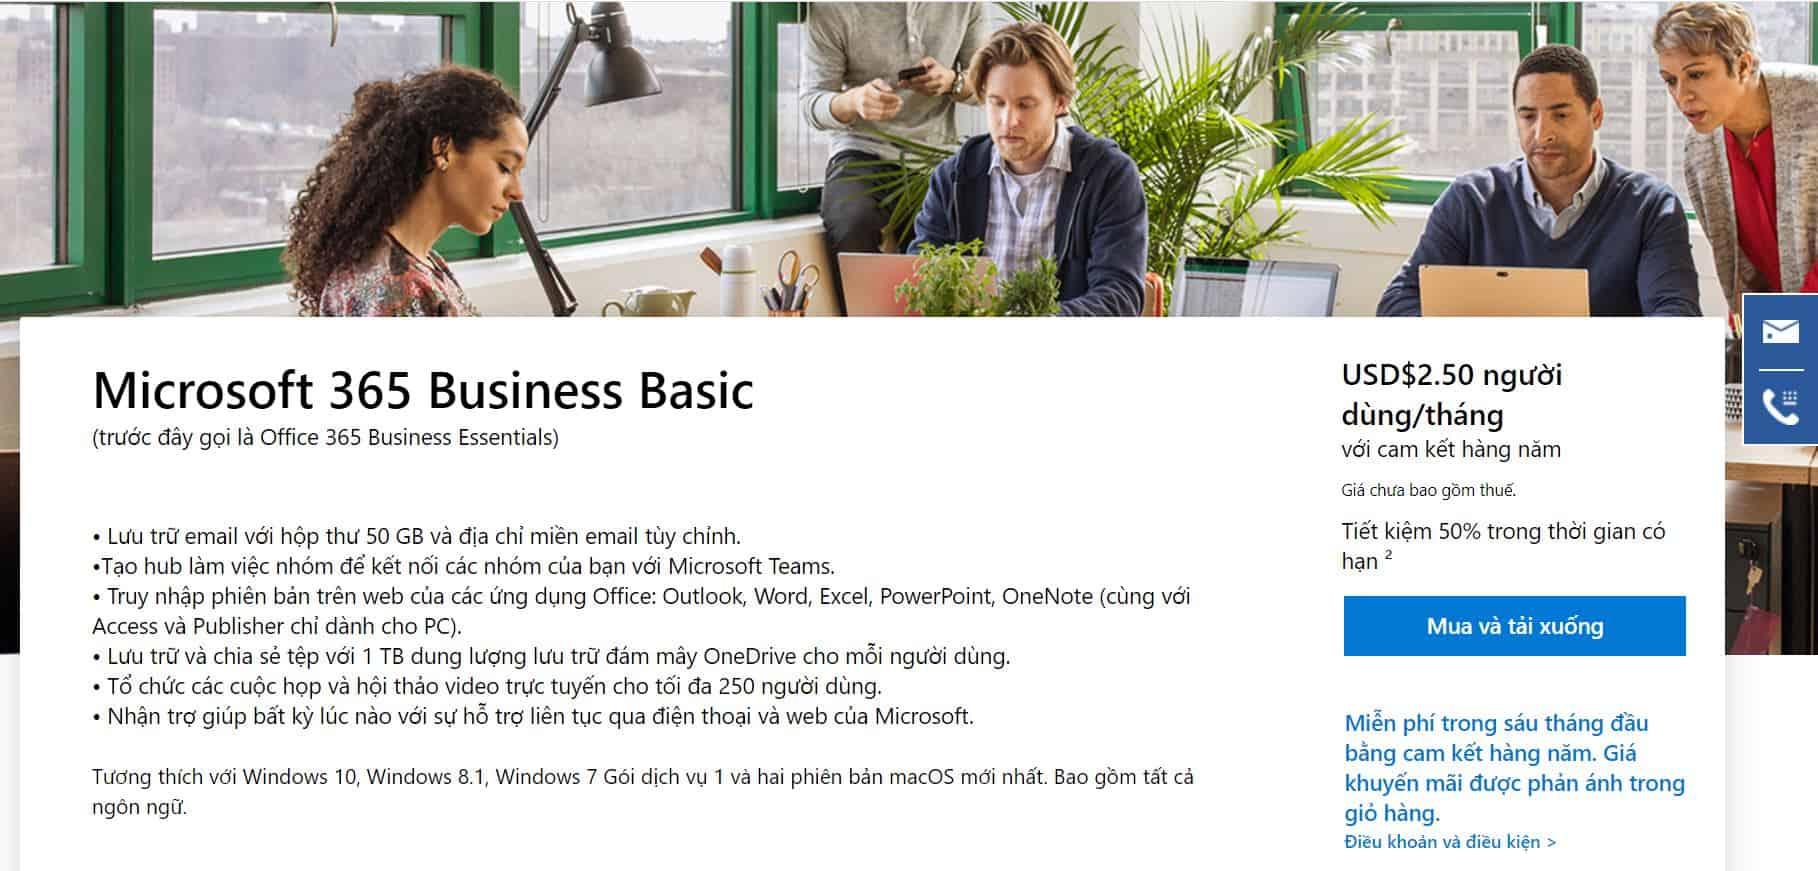 Microsoft 365 Business Basic